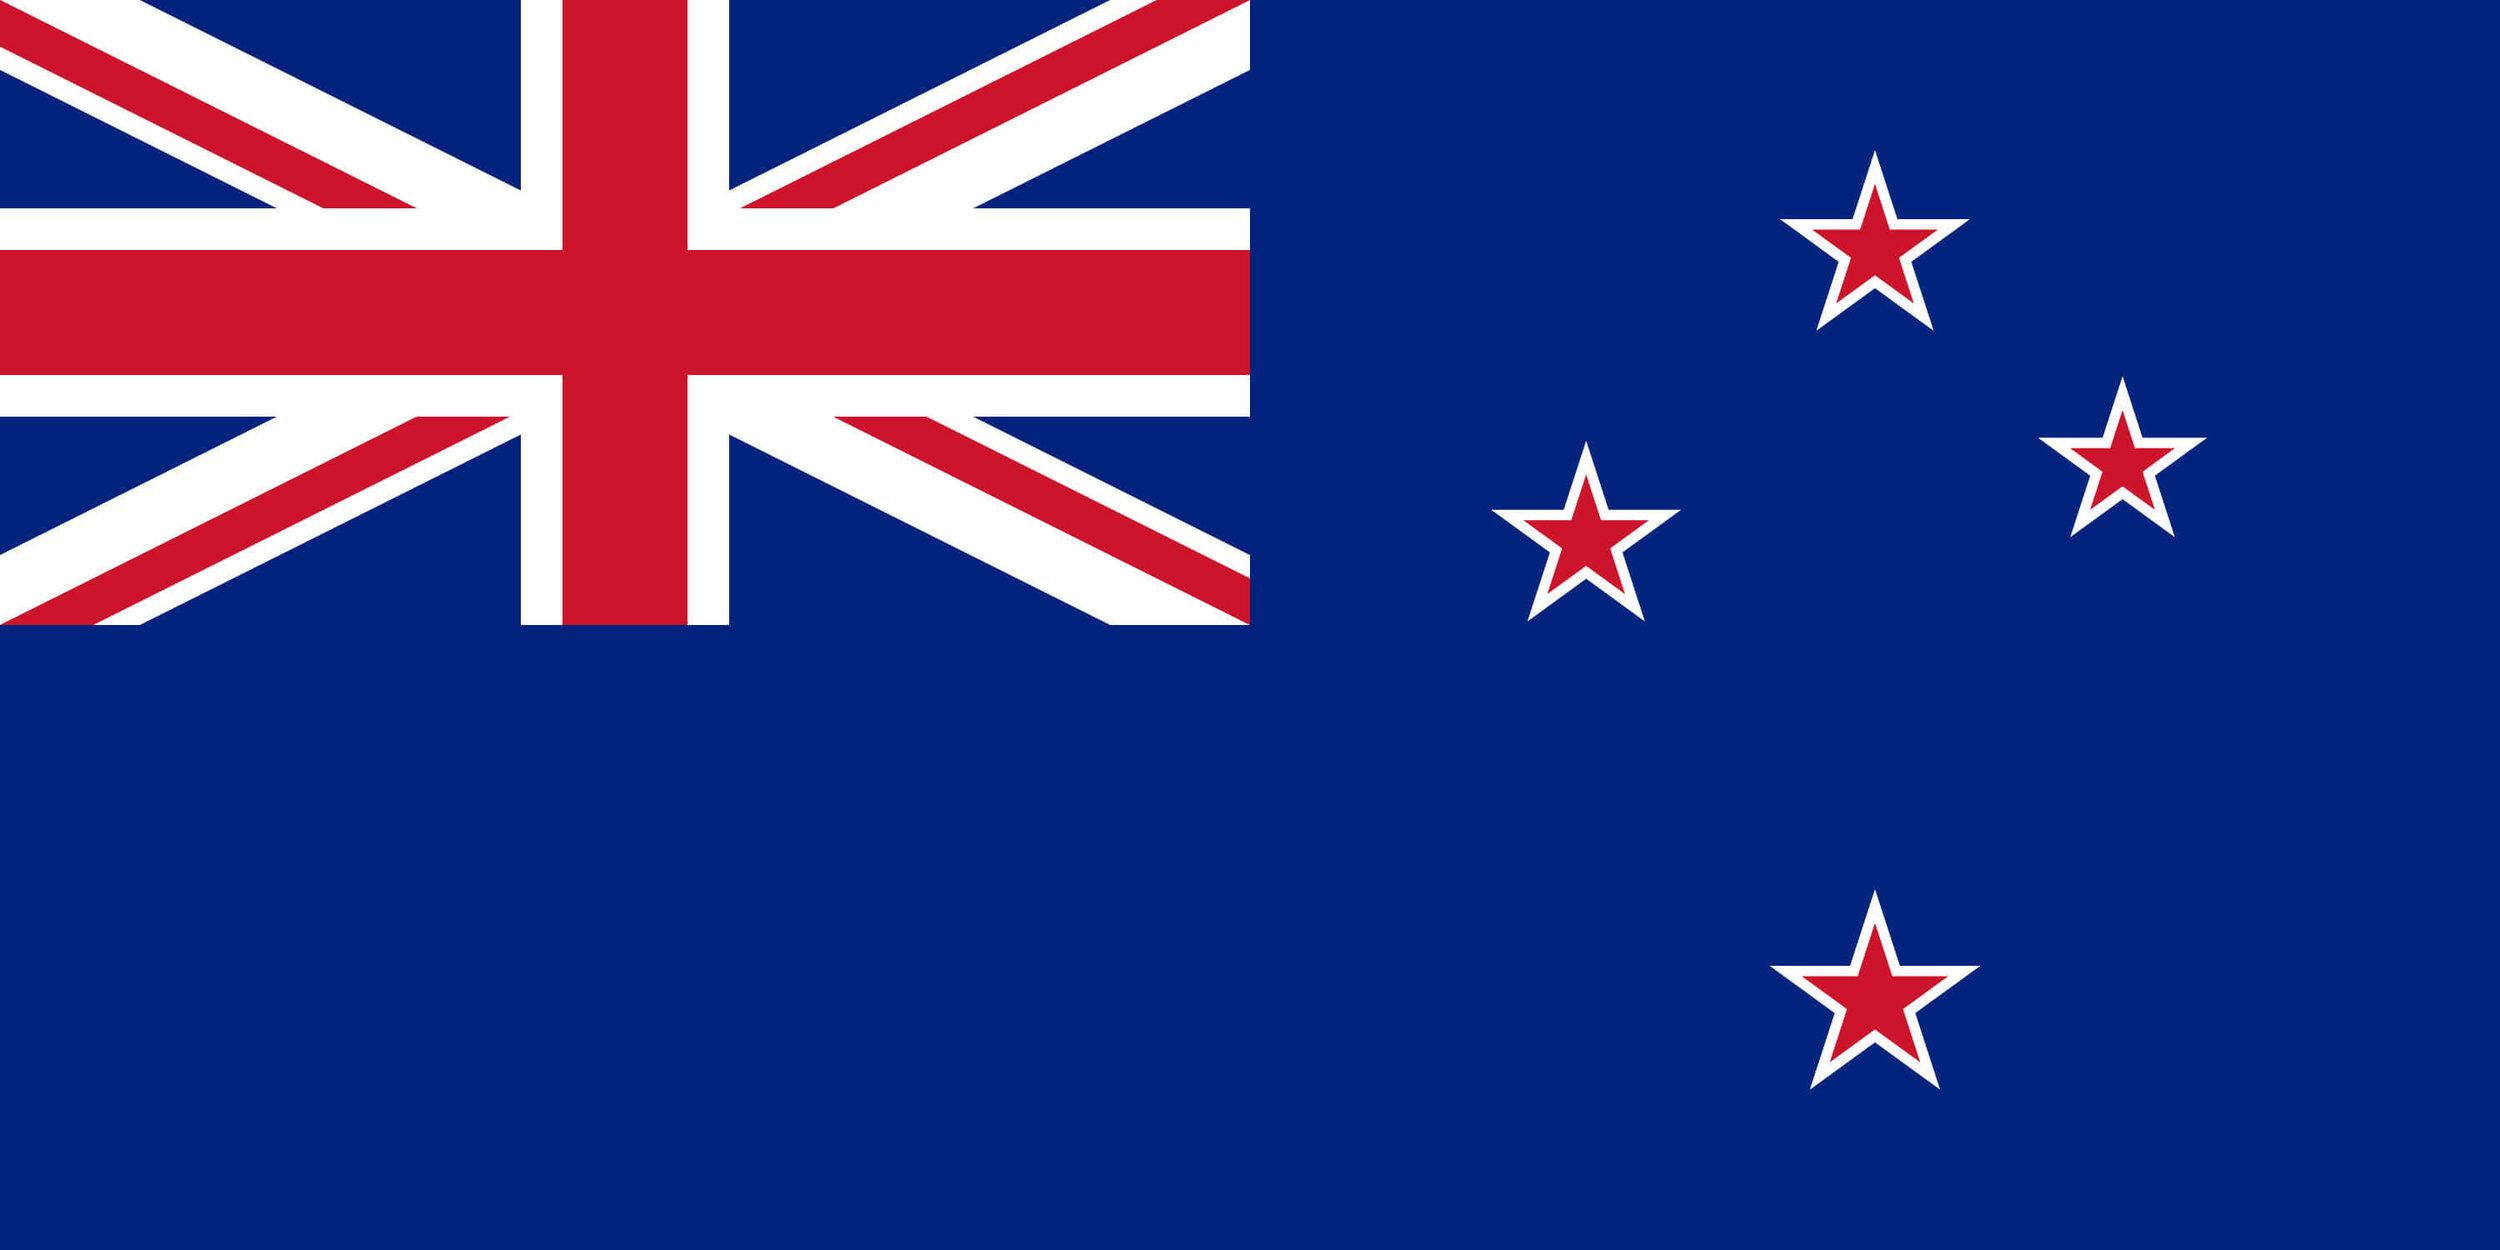 new-zealand-flag-xl.jpg